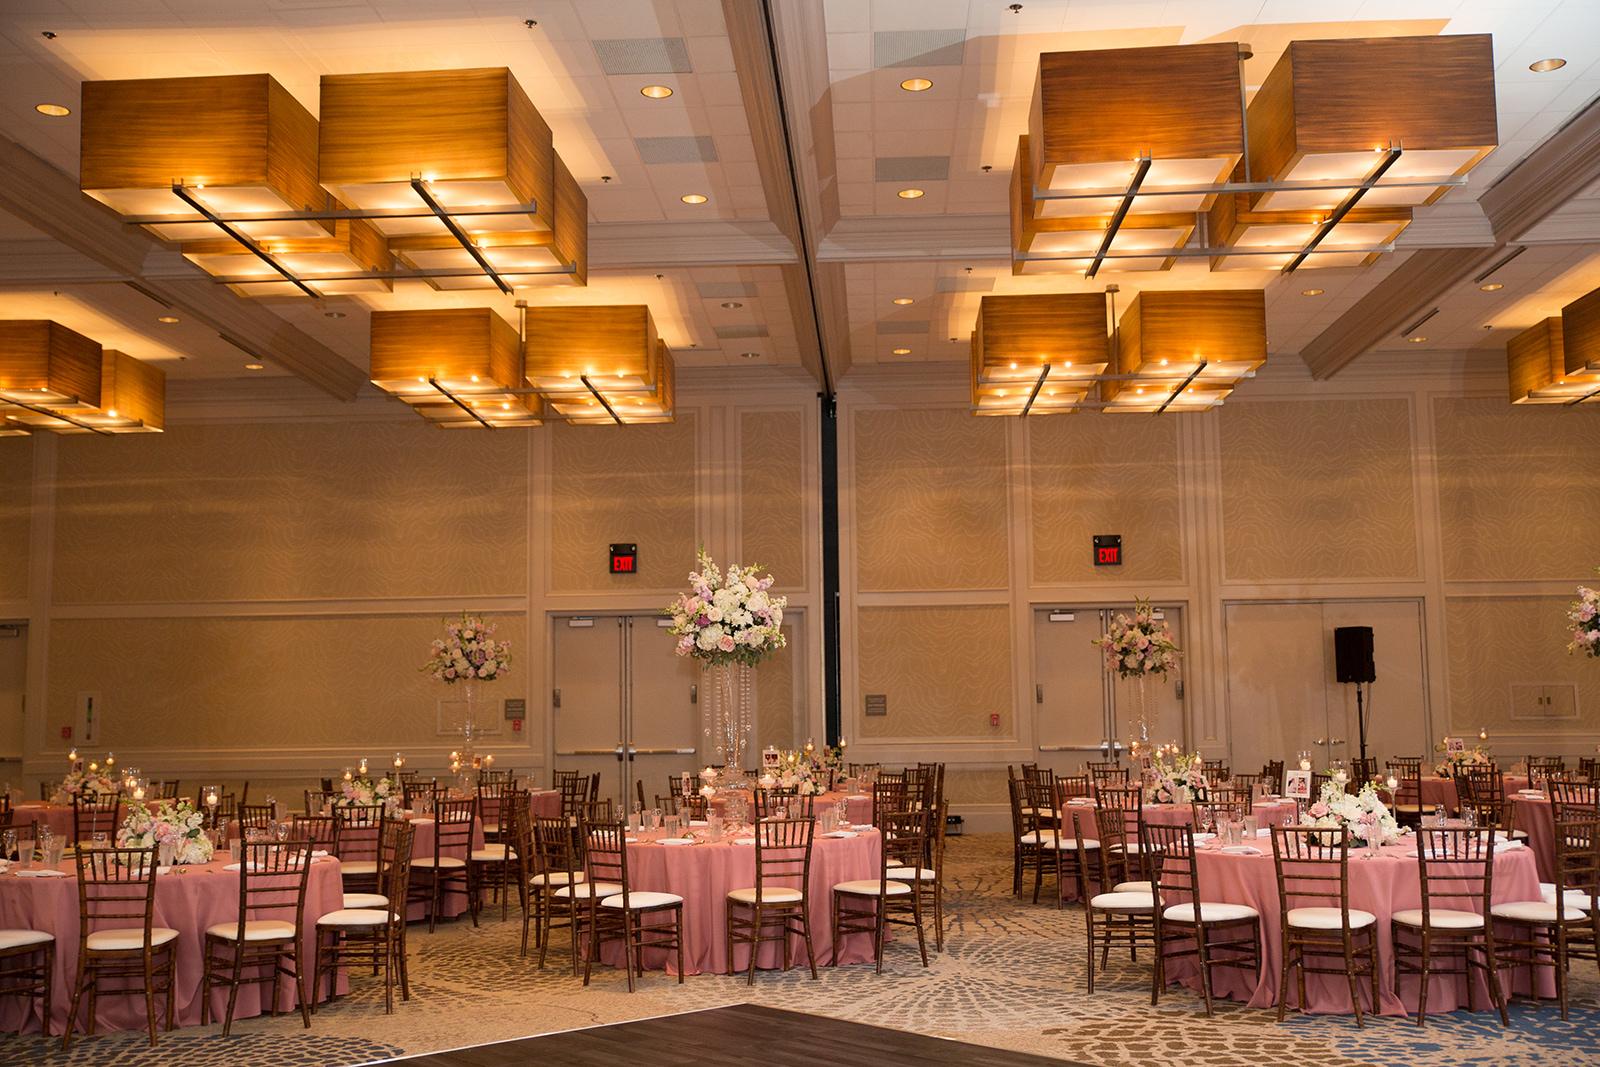 Le Cape Weddings - Sumeet and Chavi - Reception Details  -43.jpg